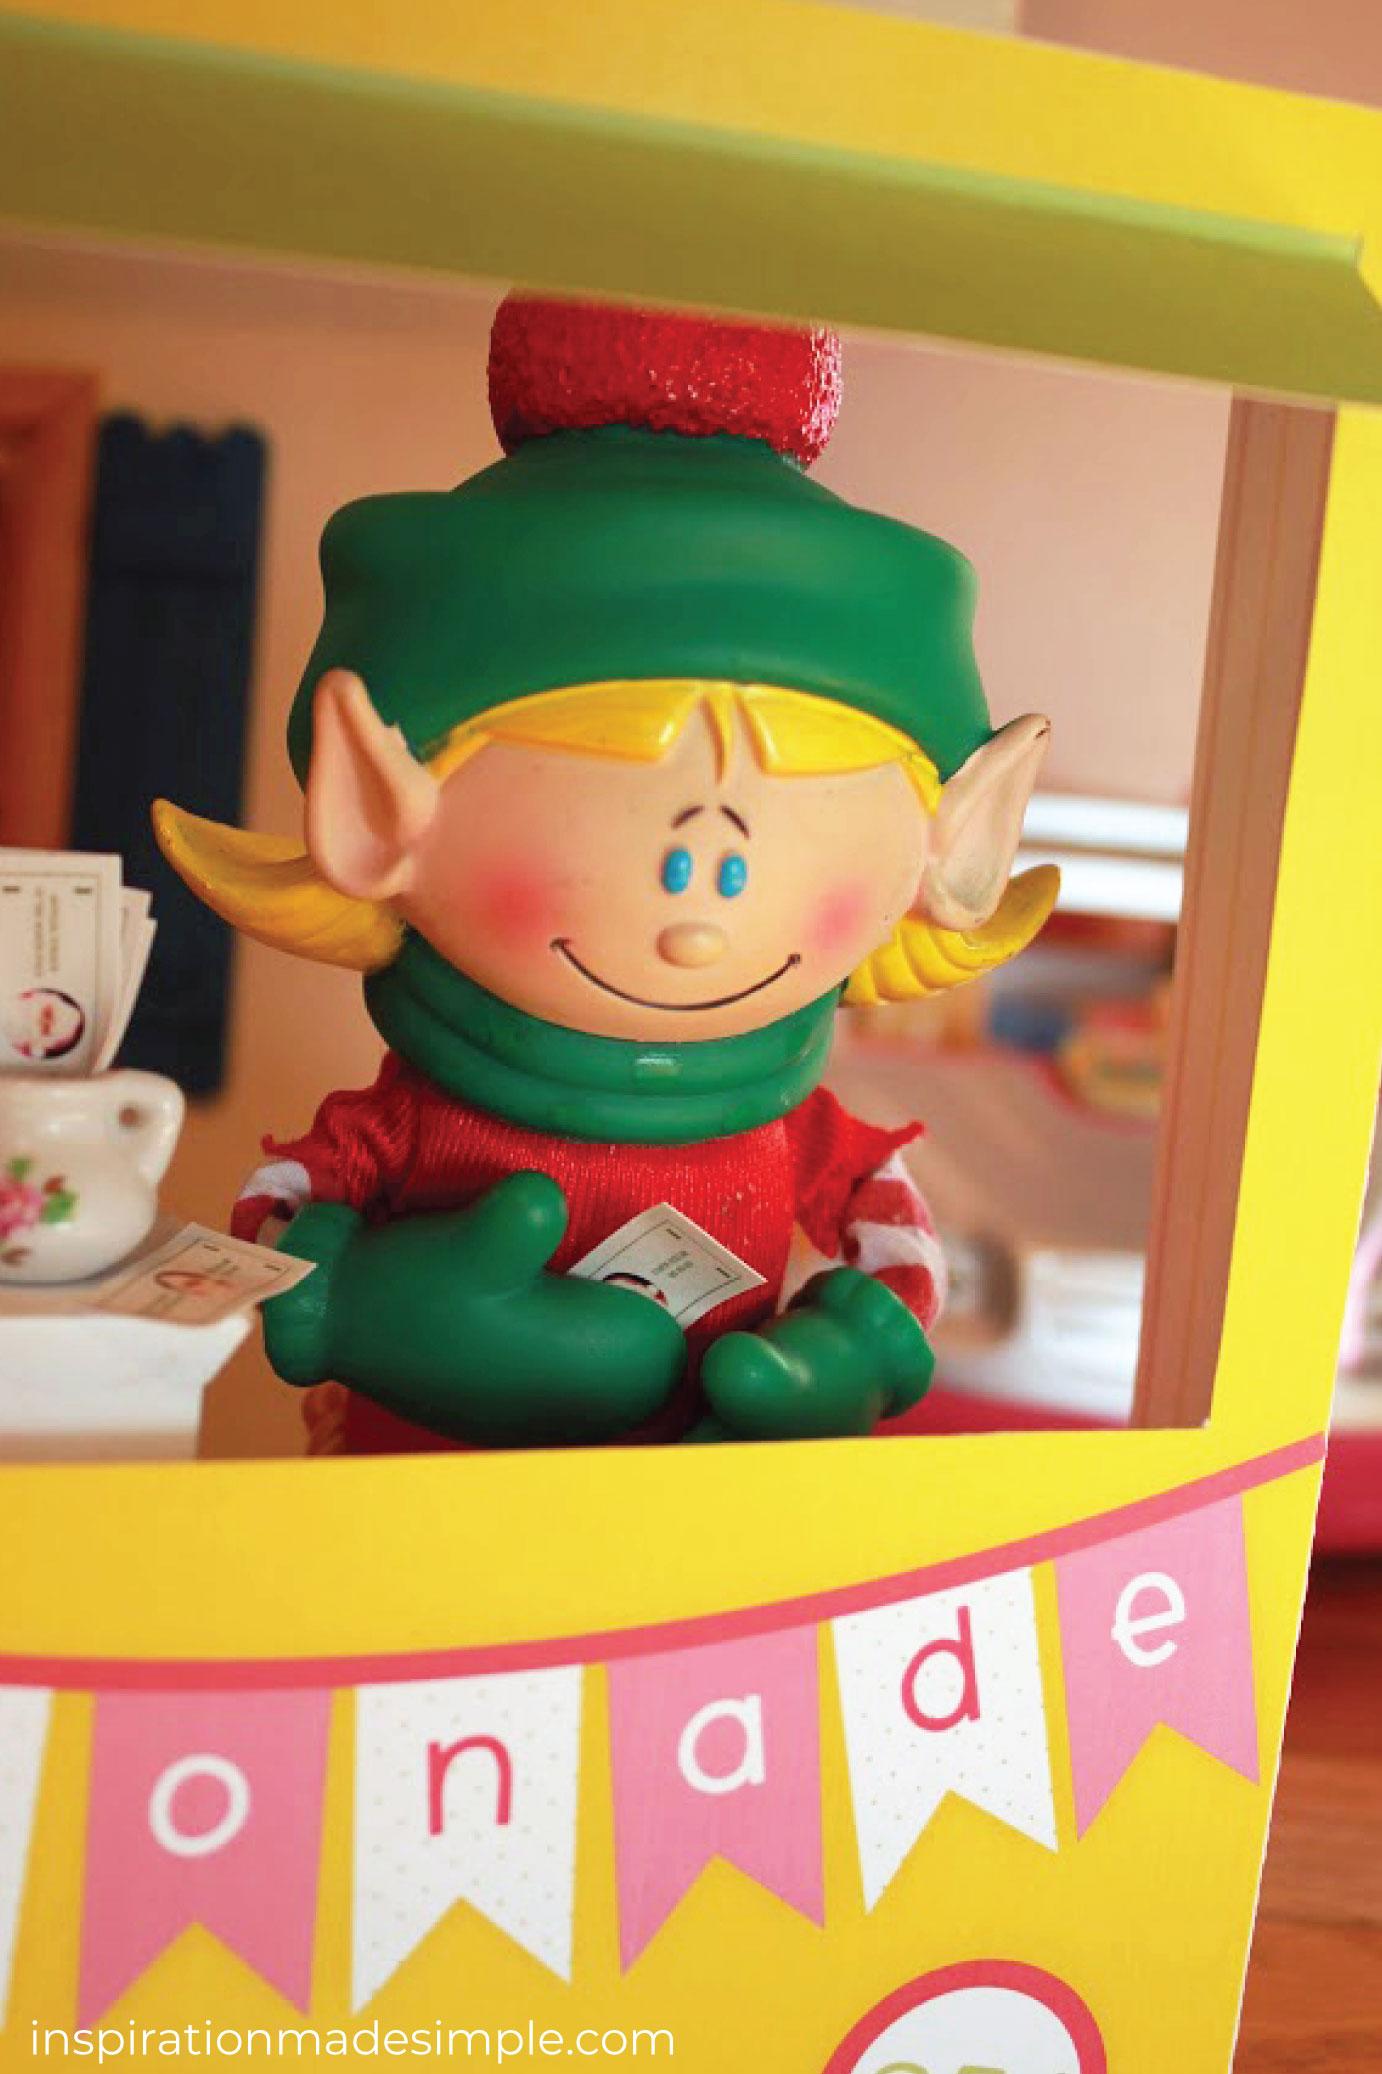 Miniature Elf on the Shelf Dollars